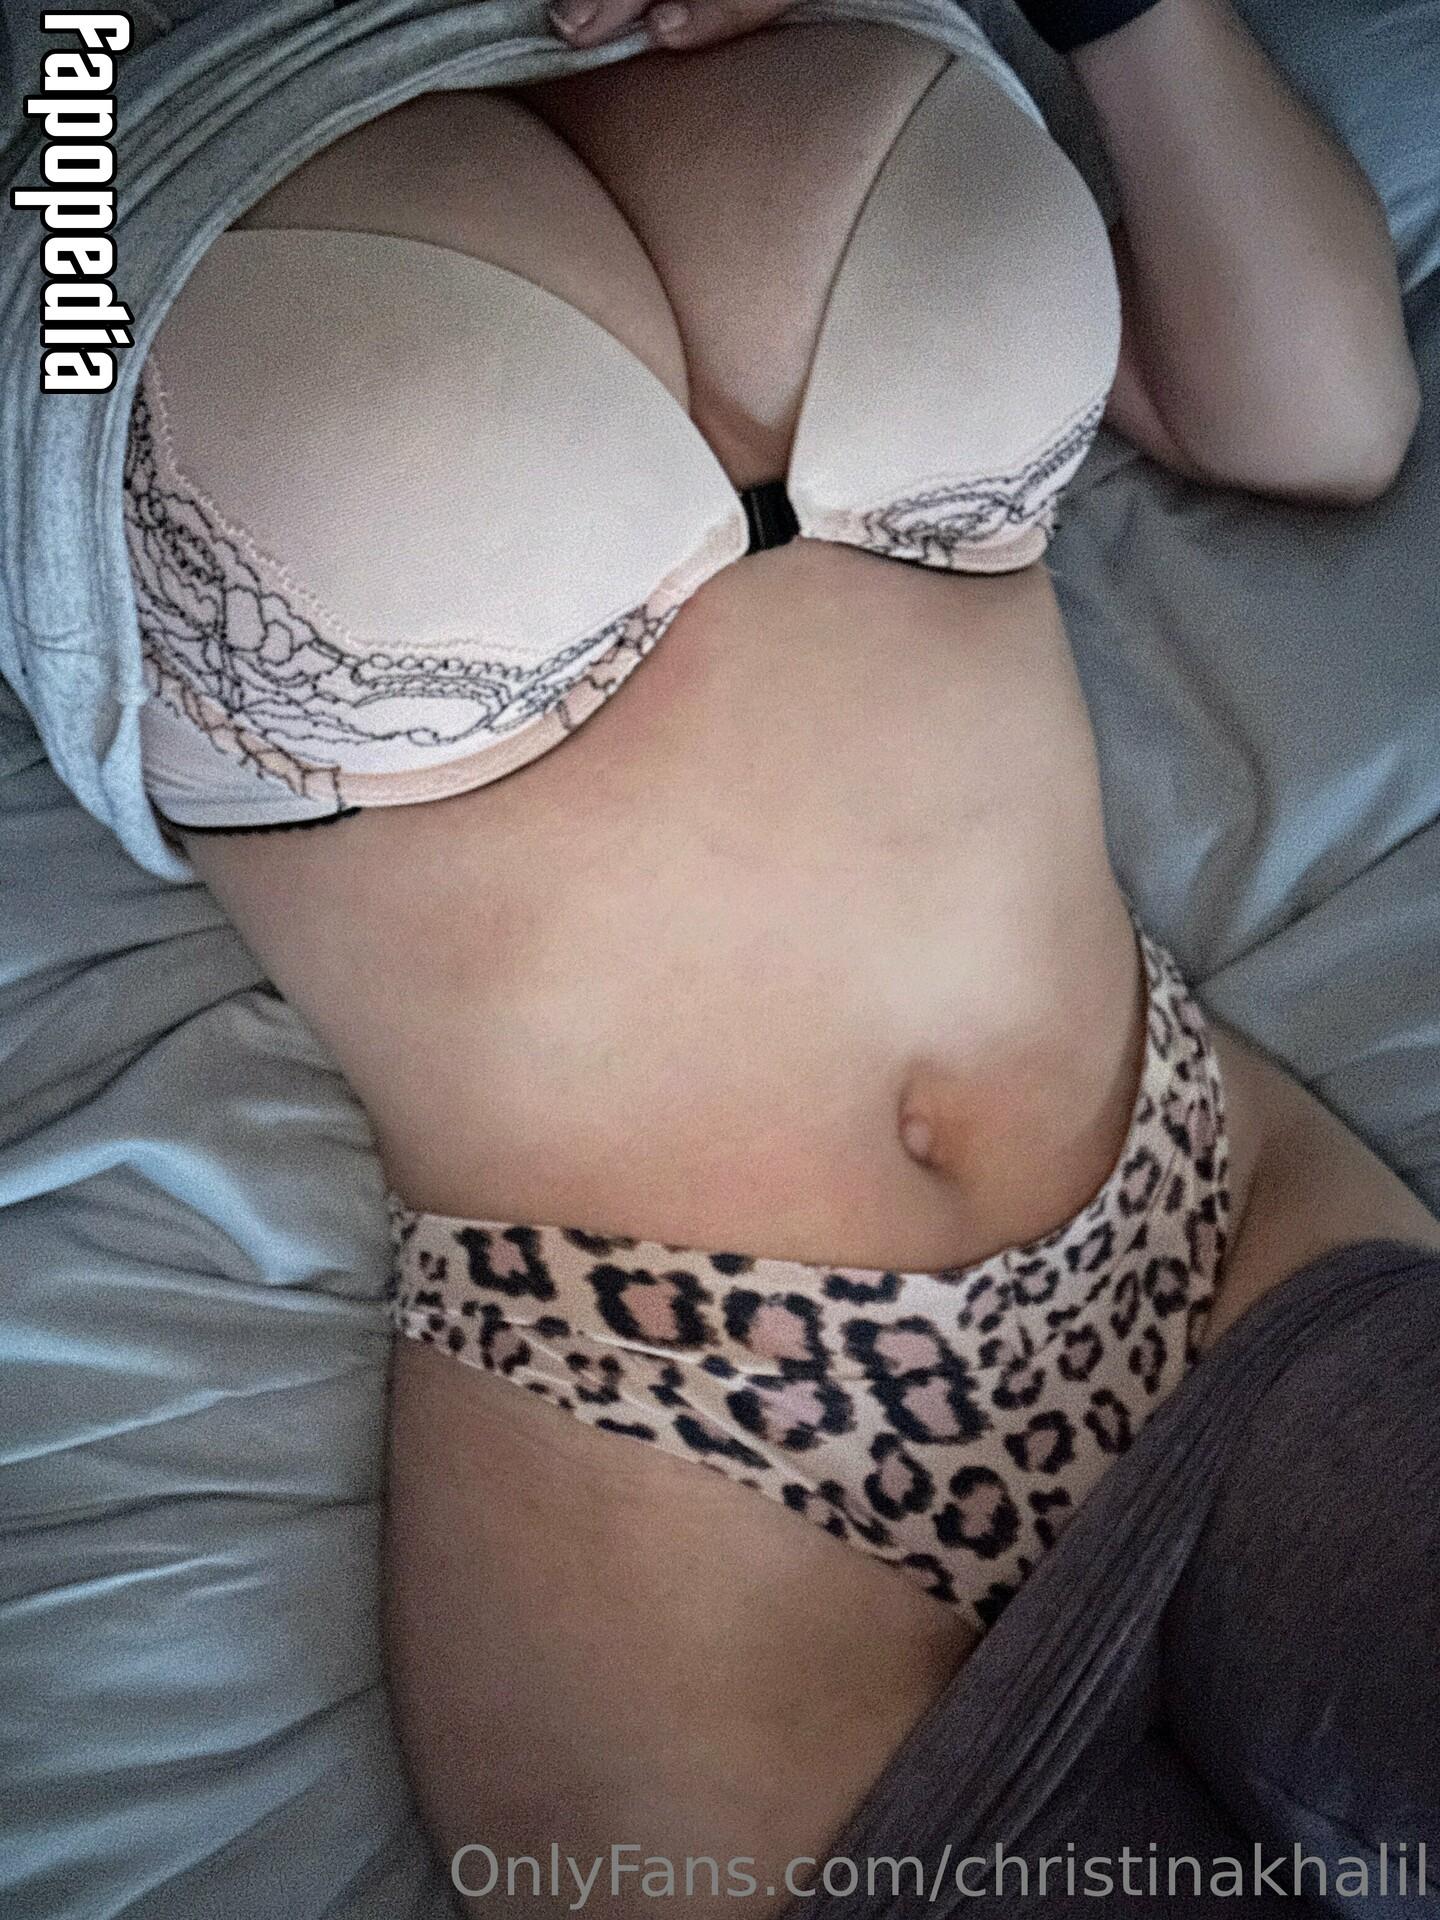 Christina Khalil Nude OnlyFans Leaks Patreon Leaks